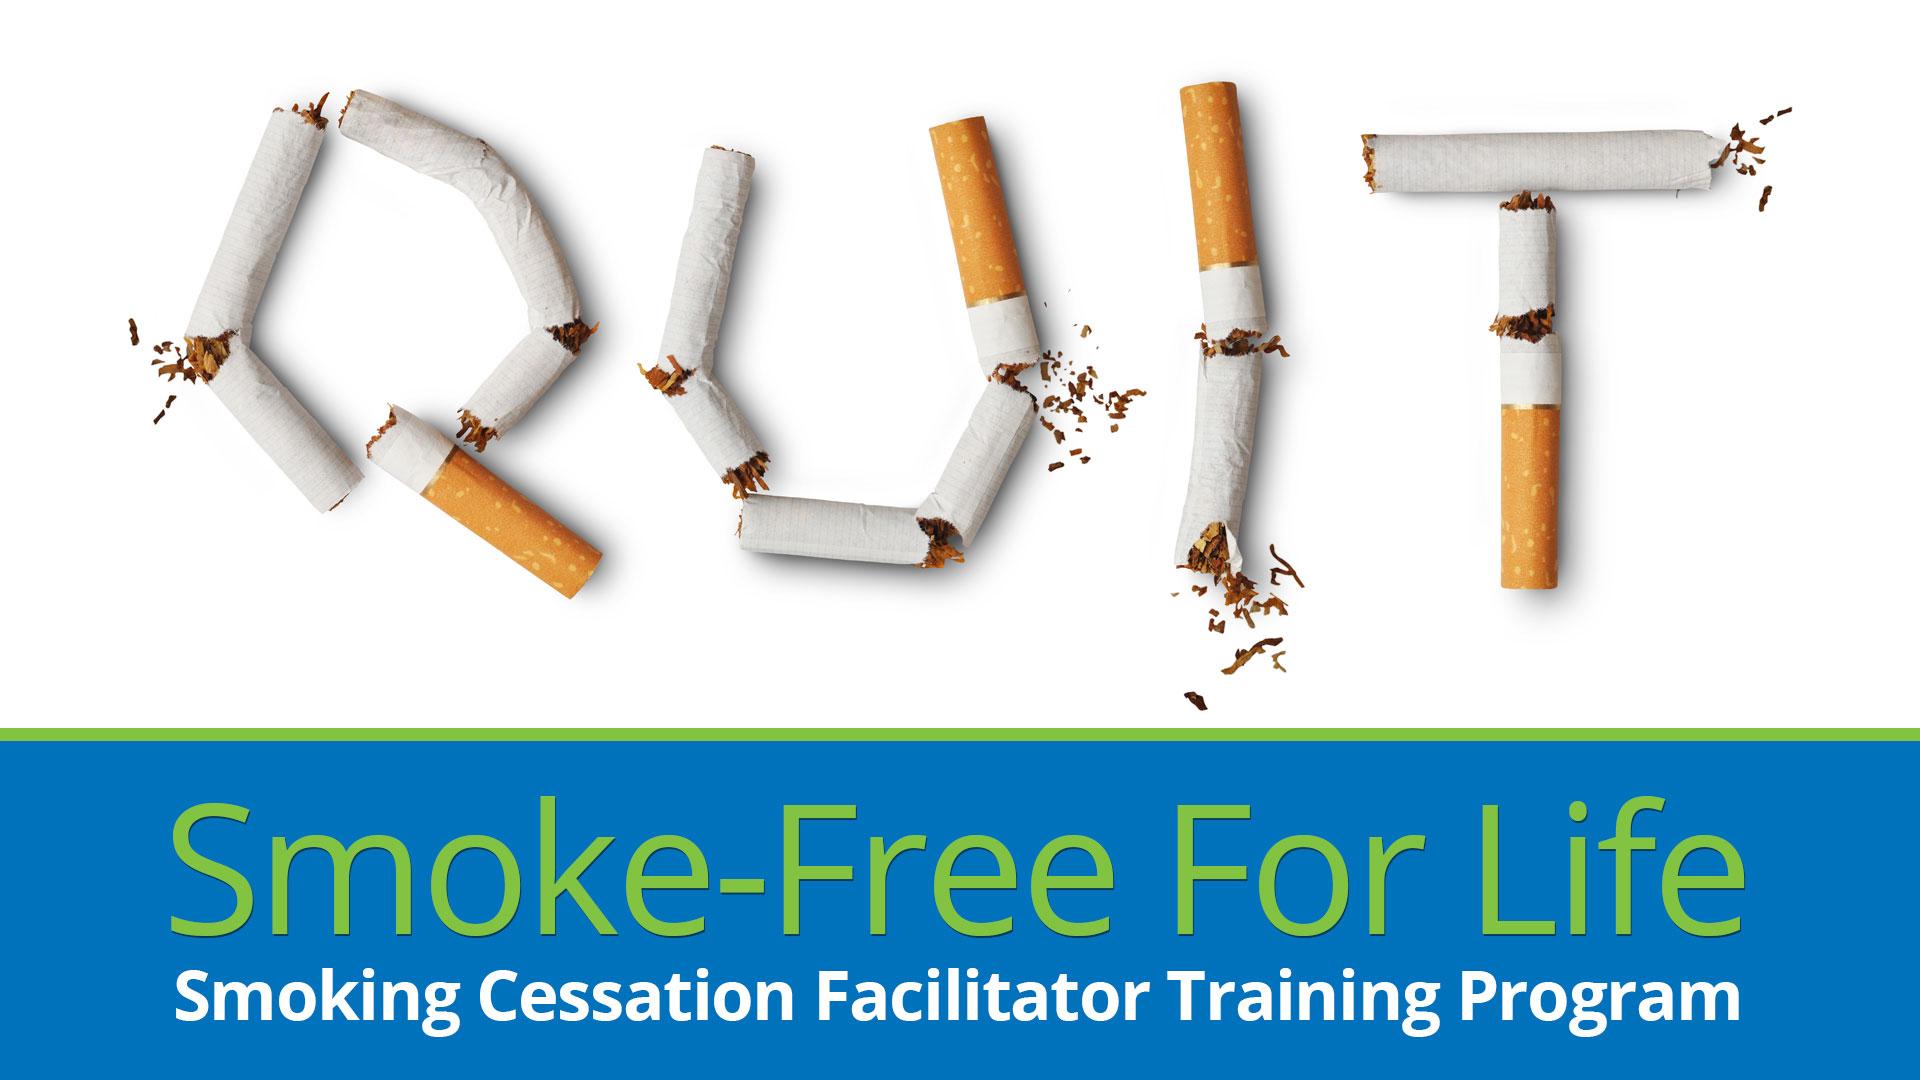 Smoking Cessation Facilitator Training